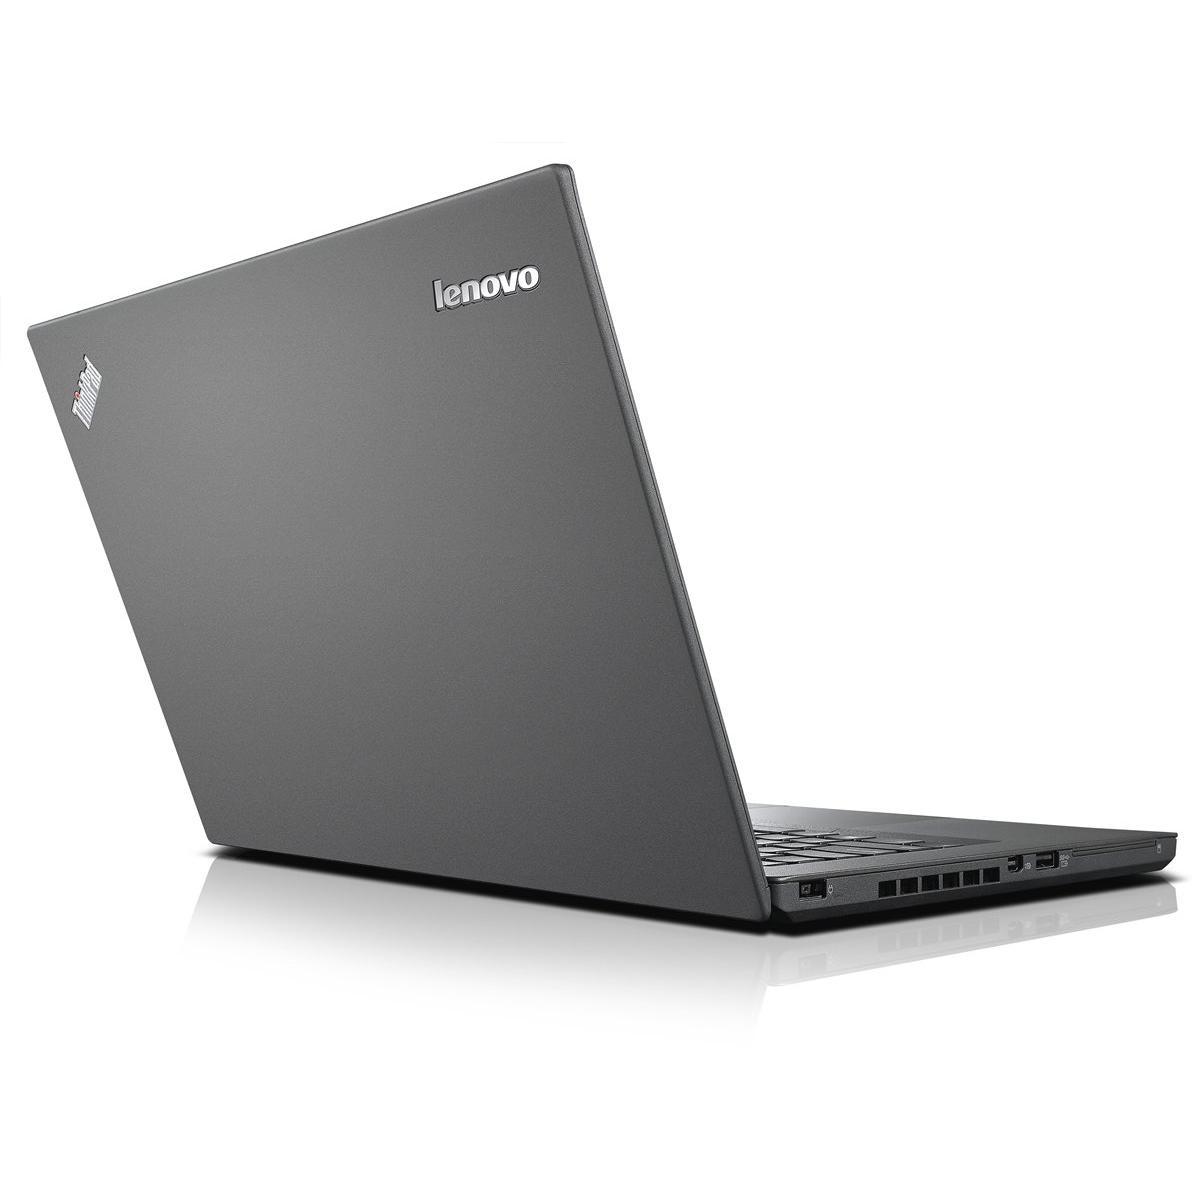 "Lenovo ThinkPad T440 14"" Core i5 2,6 GHz - SSD 128 GB - 4GB QWERTY - Spanisch"